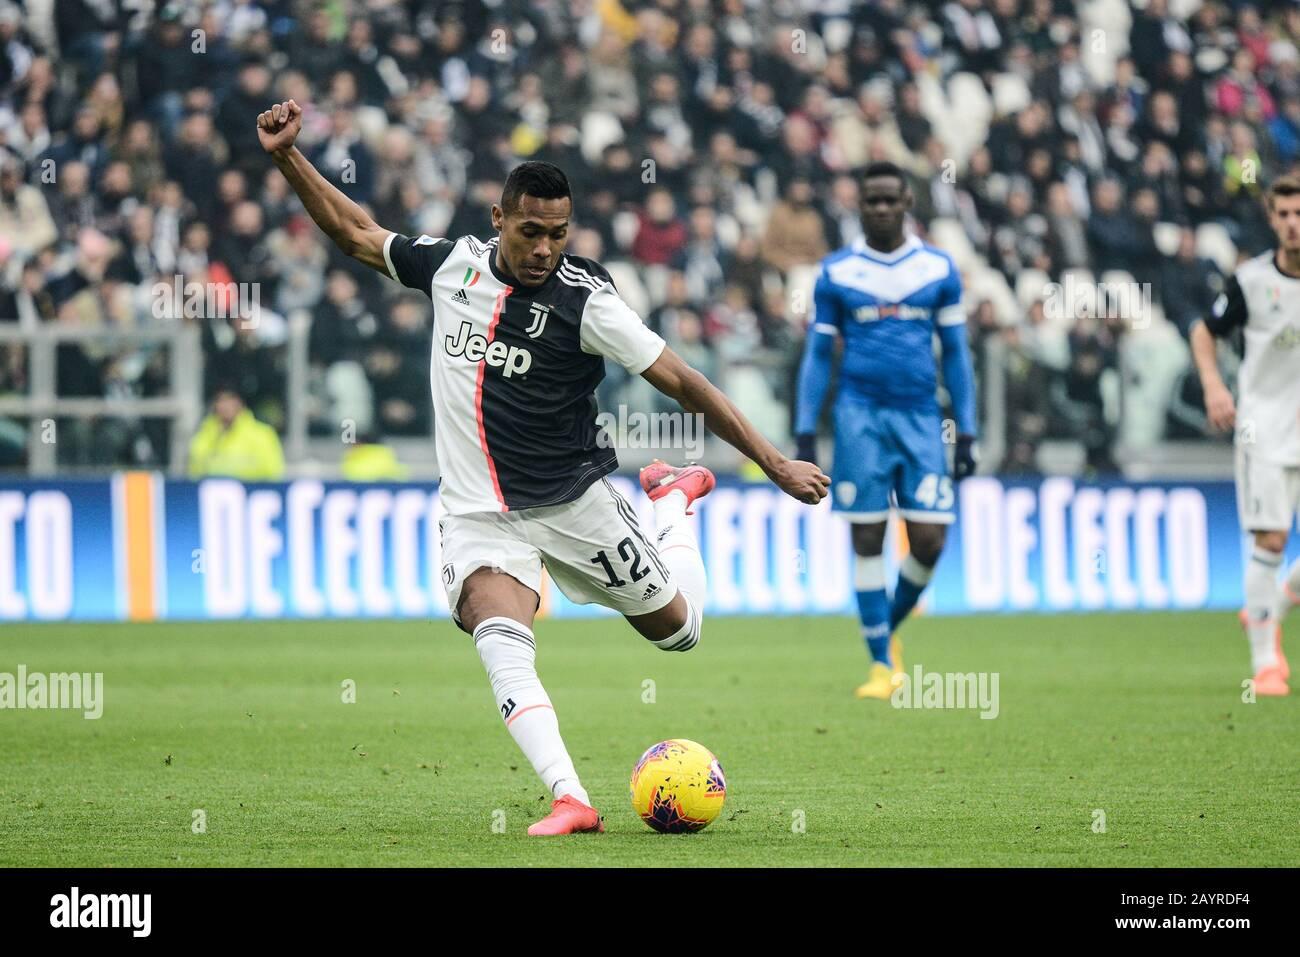 Of Juventus Fc During The Serie A Football Match Between Juventus Fc And Brescia Calcio Juventus Fc Won 2 0 Over Brescia Calcio At Allianz Stadium Stock Photo Alamy